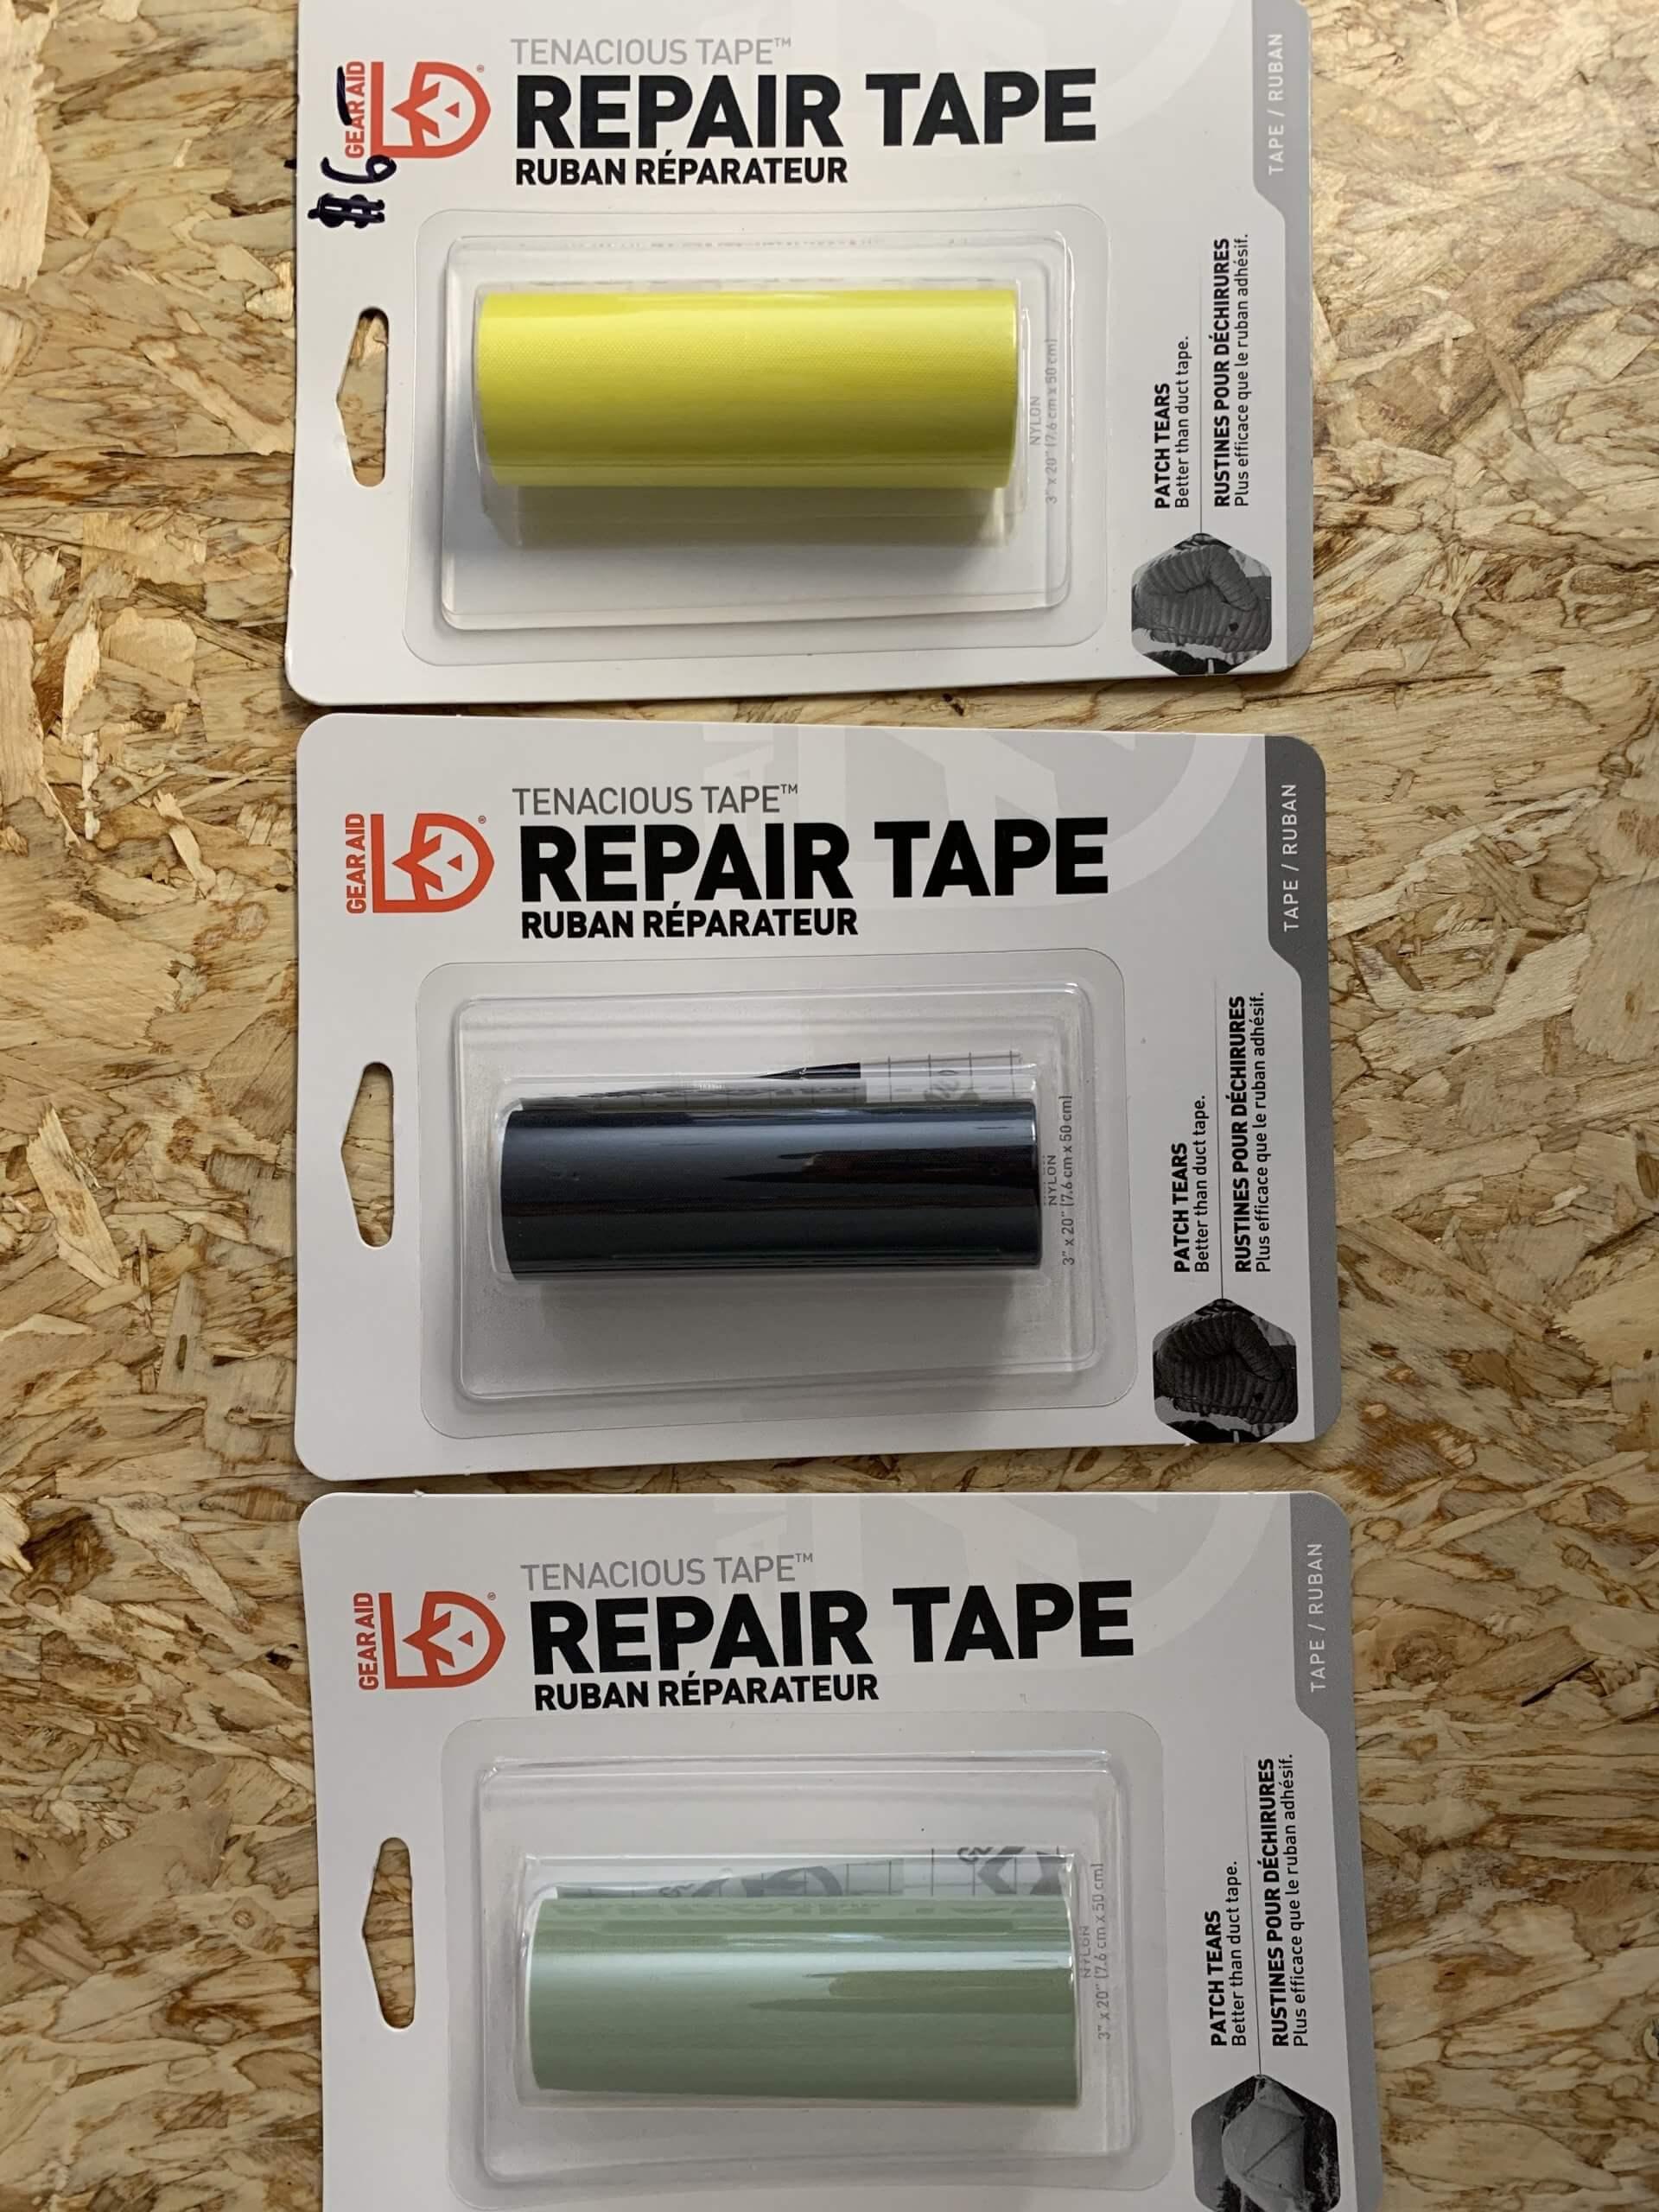 How to use Tenacious Tape